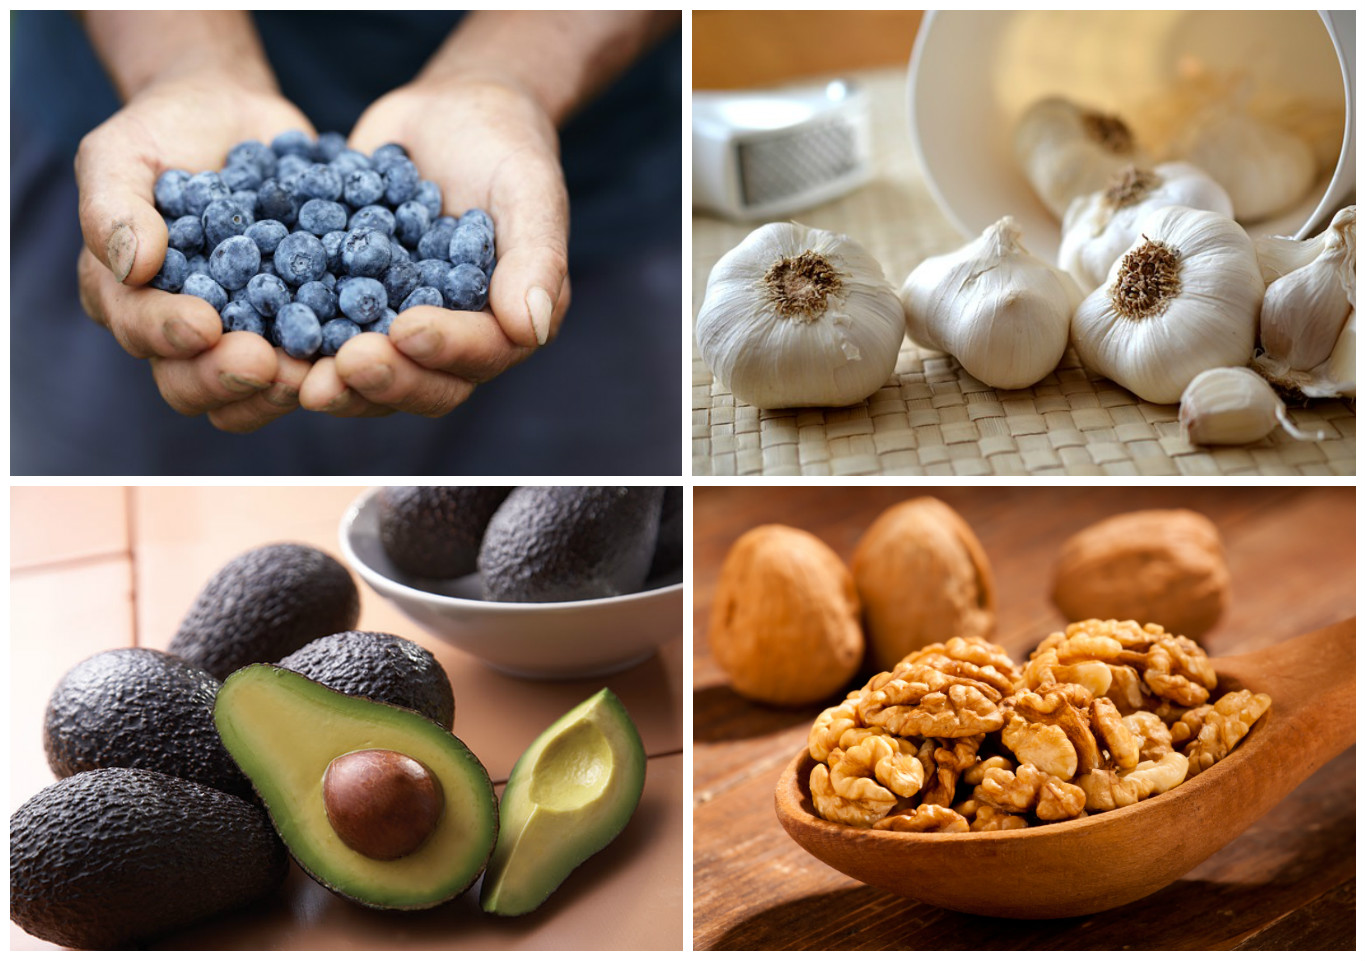 Five Foods Better Than Medicine